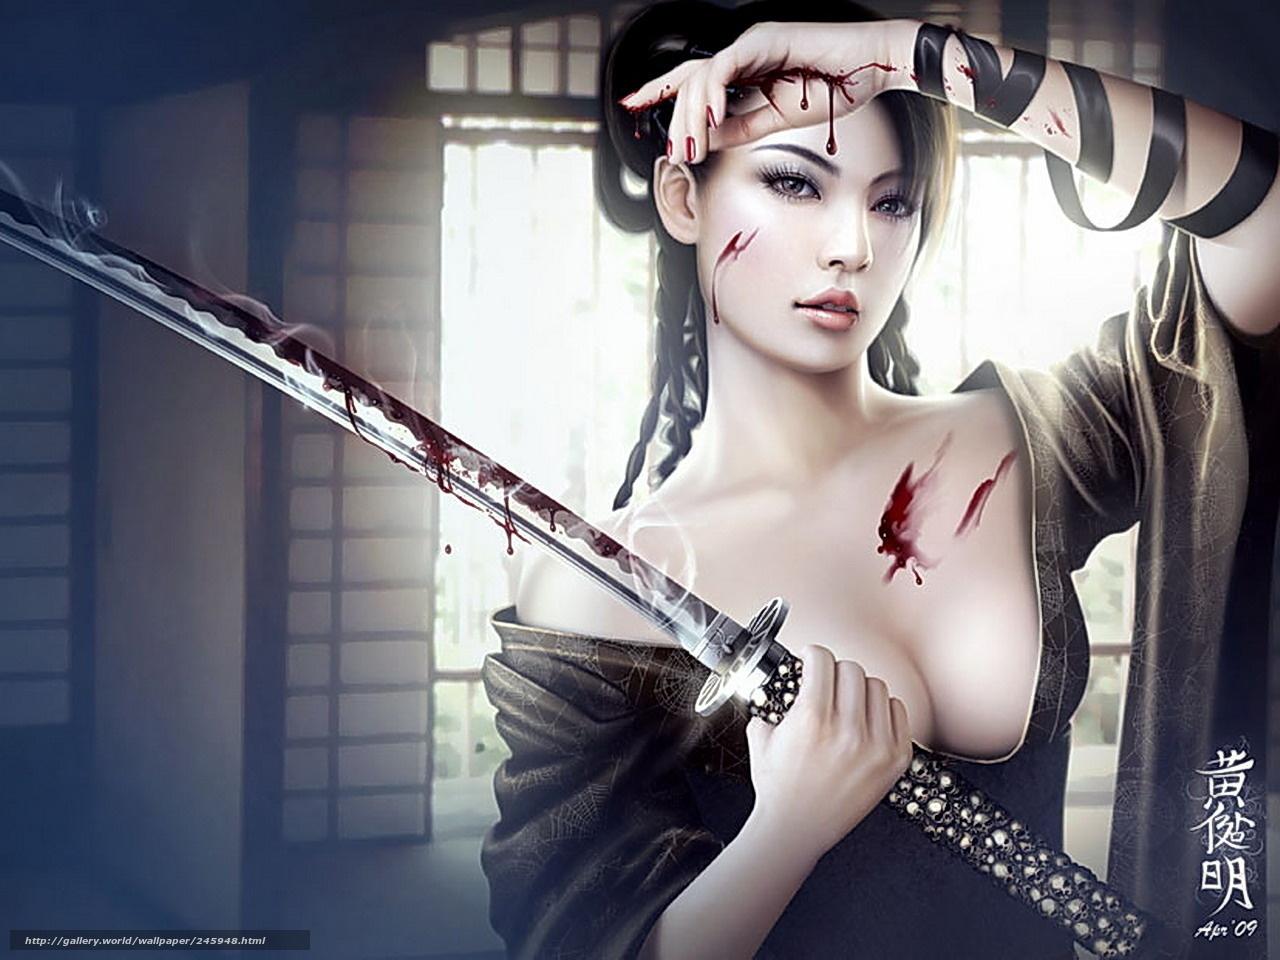 Samurai sexy hot girl pics sex pics